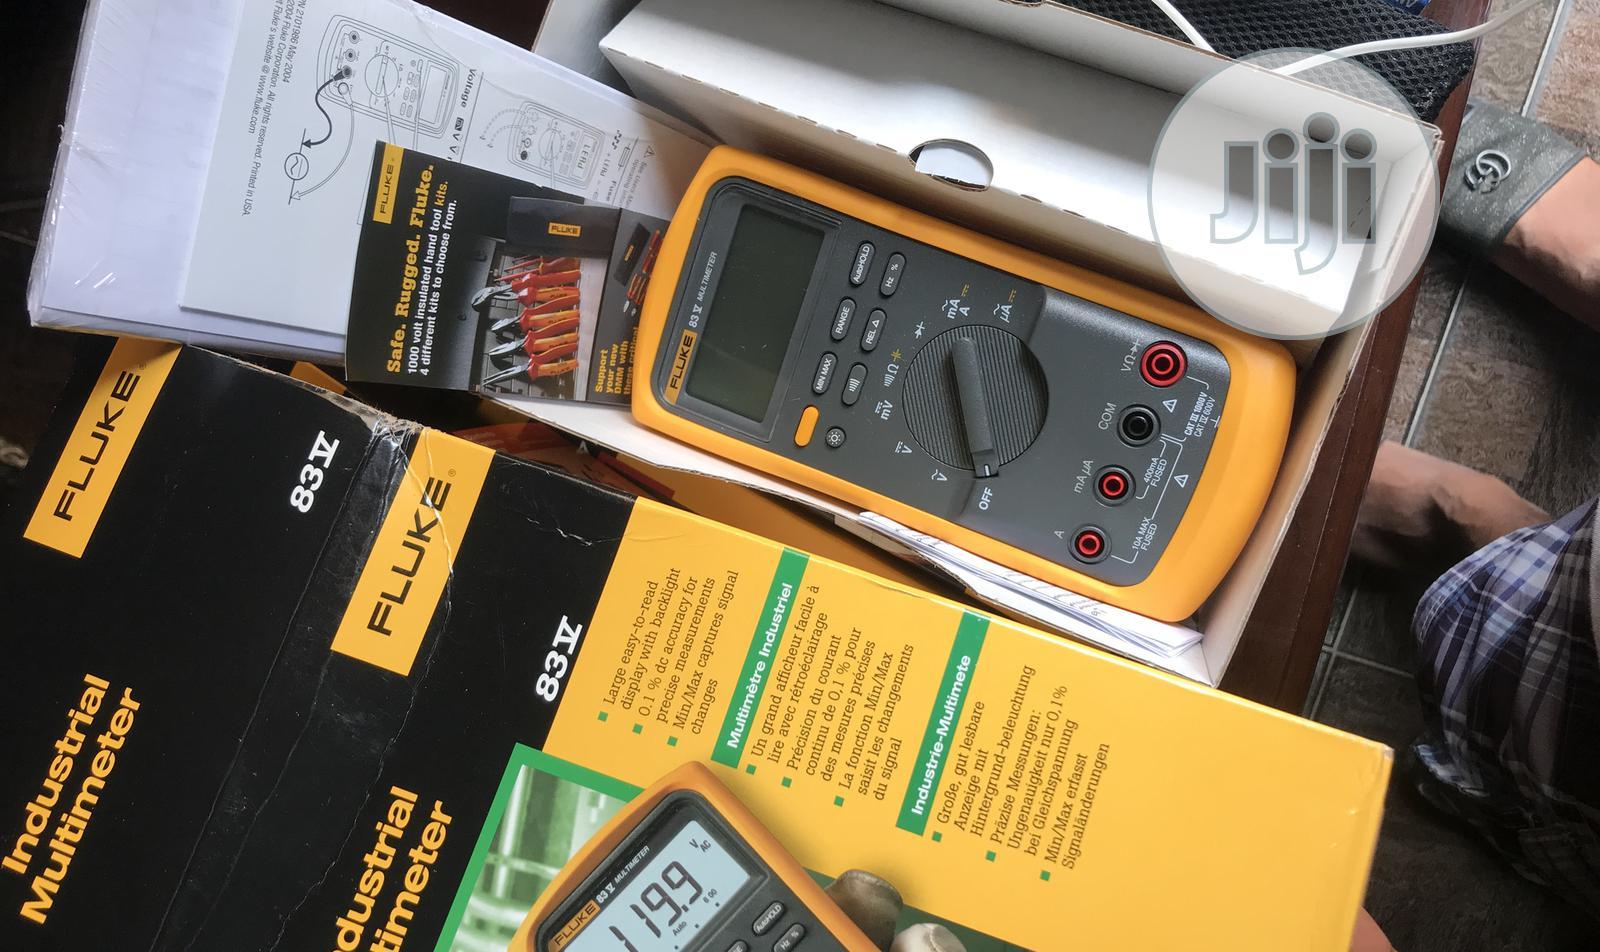 Fluke 83v Industrial Digital Multimeter | Measuring & Layout Tools for sale in Ojo, Lagos State, Nigeria